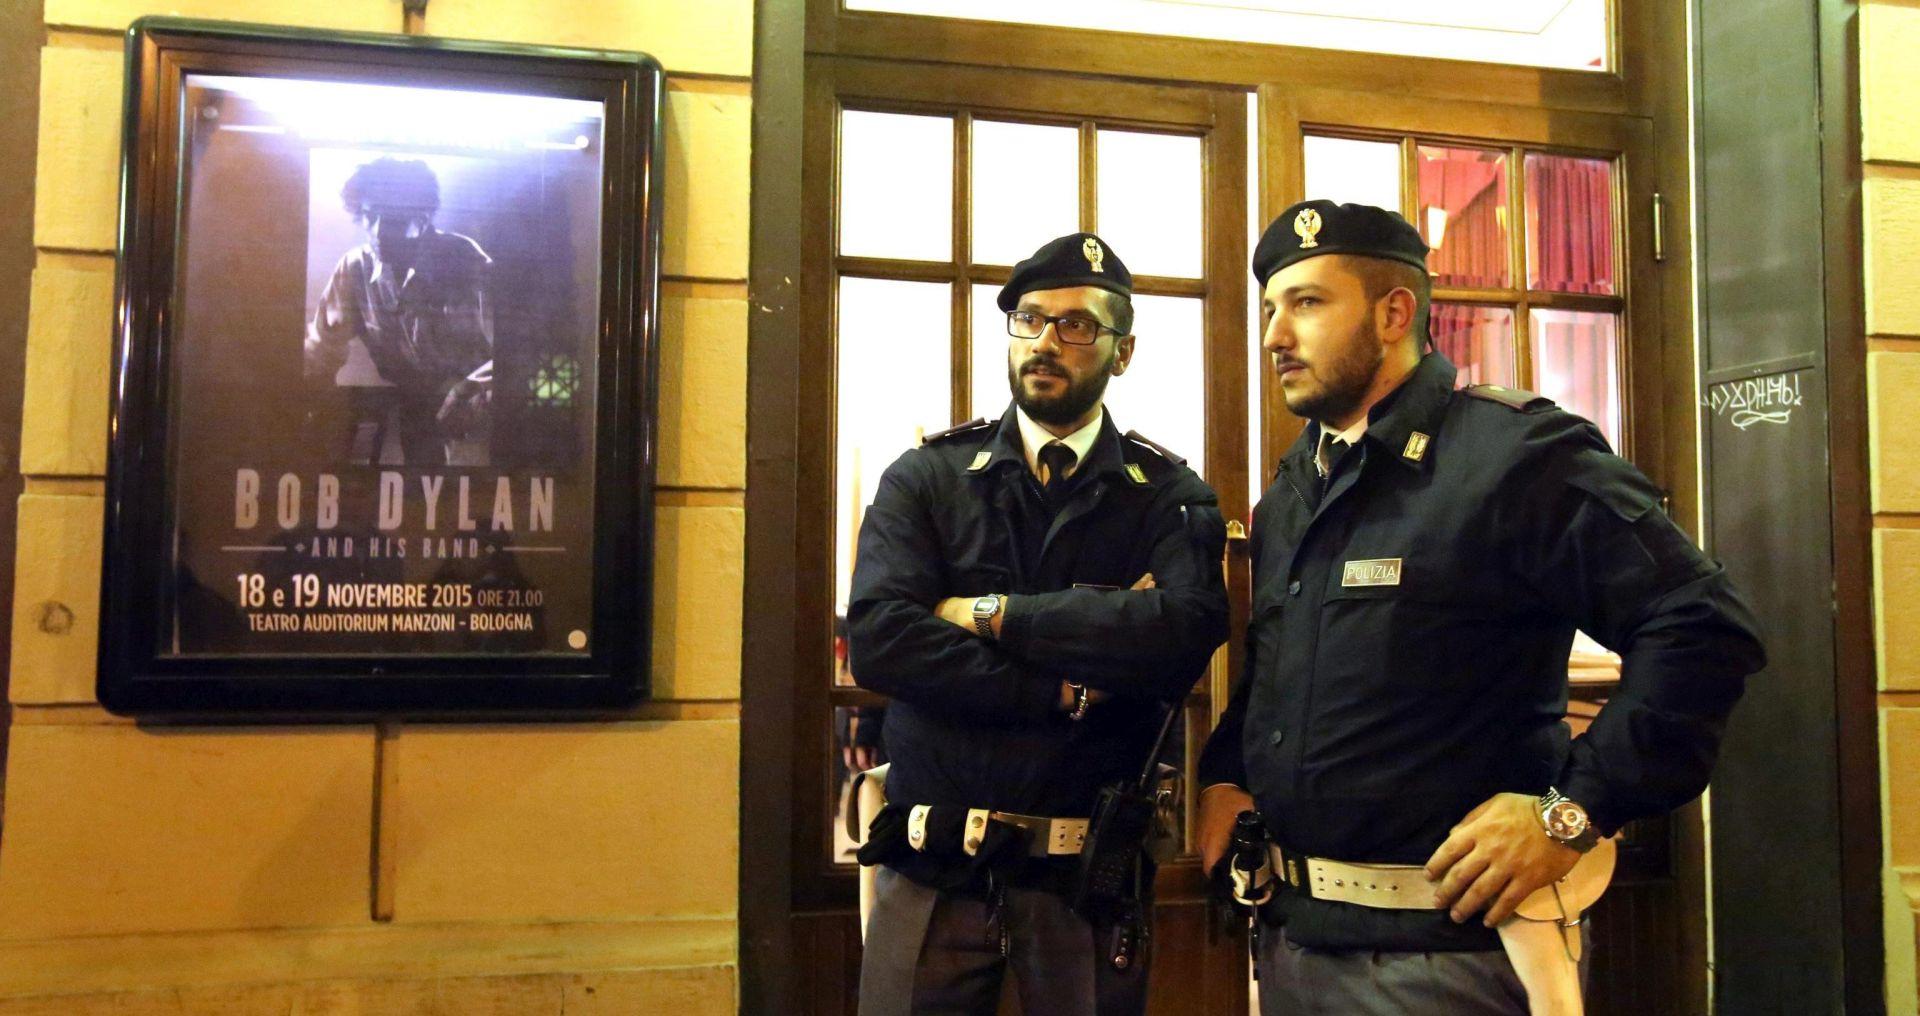 RAZUMLJIV OPREZ Bob Dylan zatražio pojačano osiguranje na koncertima u Bologni